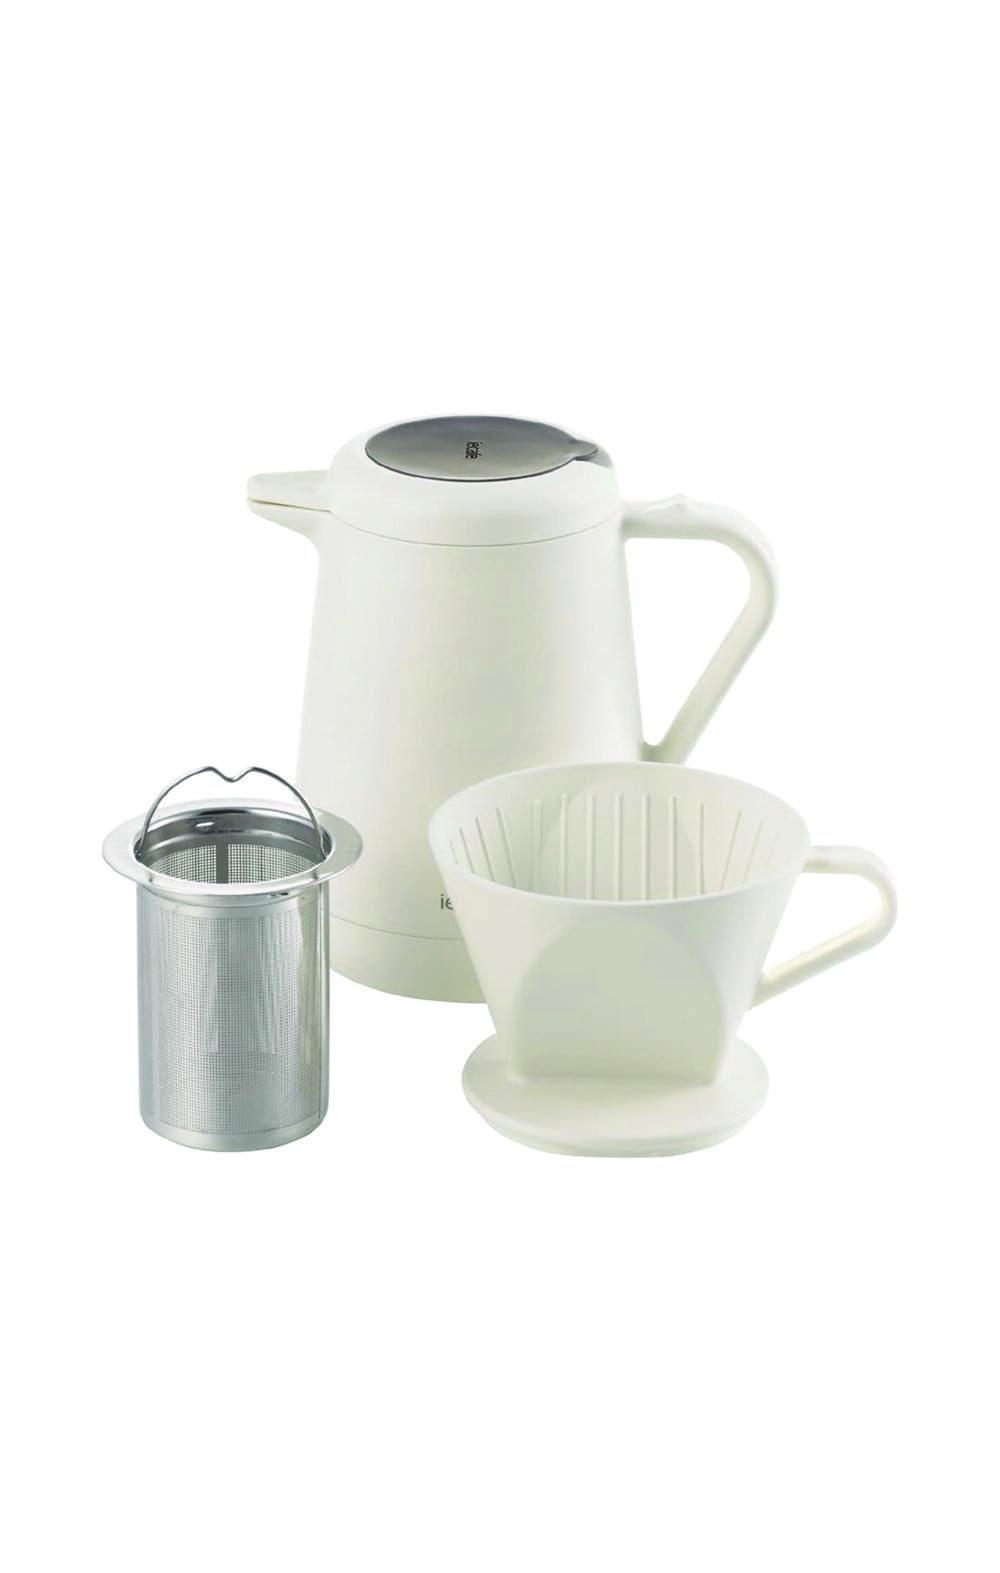 Pearl Metal HB-1074 Ie coffee pot insulation & coffee pot 620ml white  سيت ترمس مع كوب